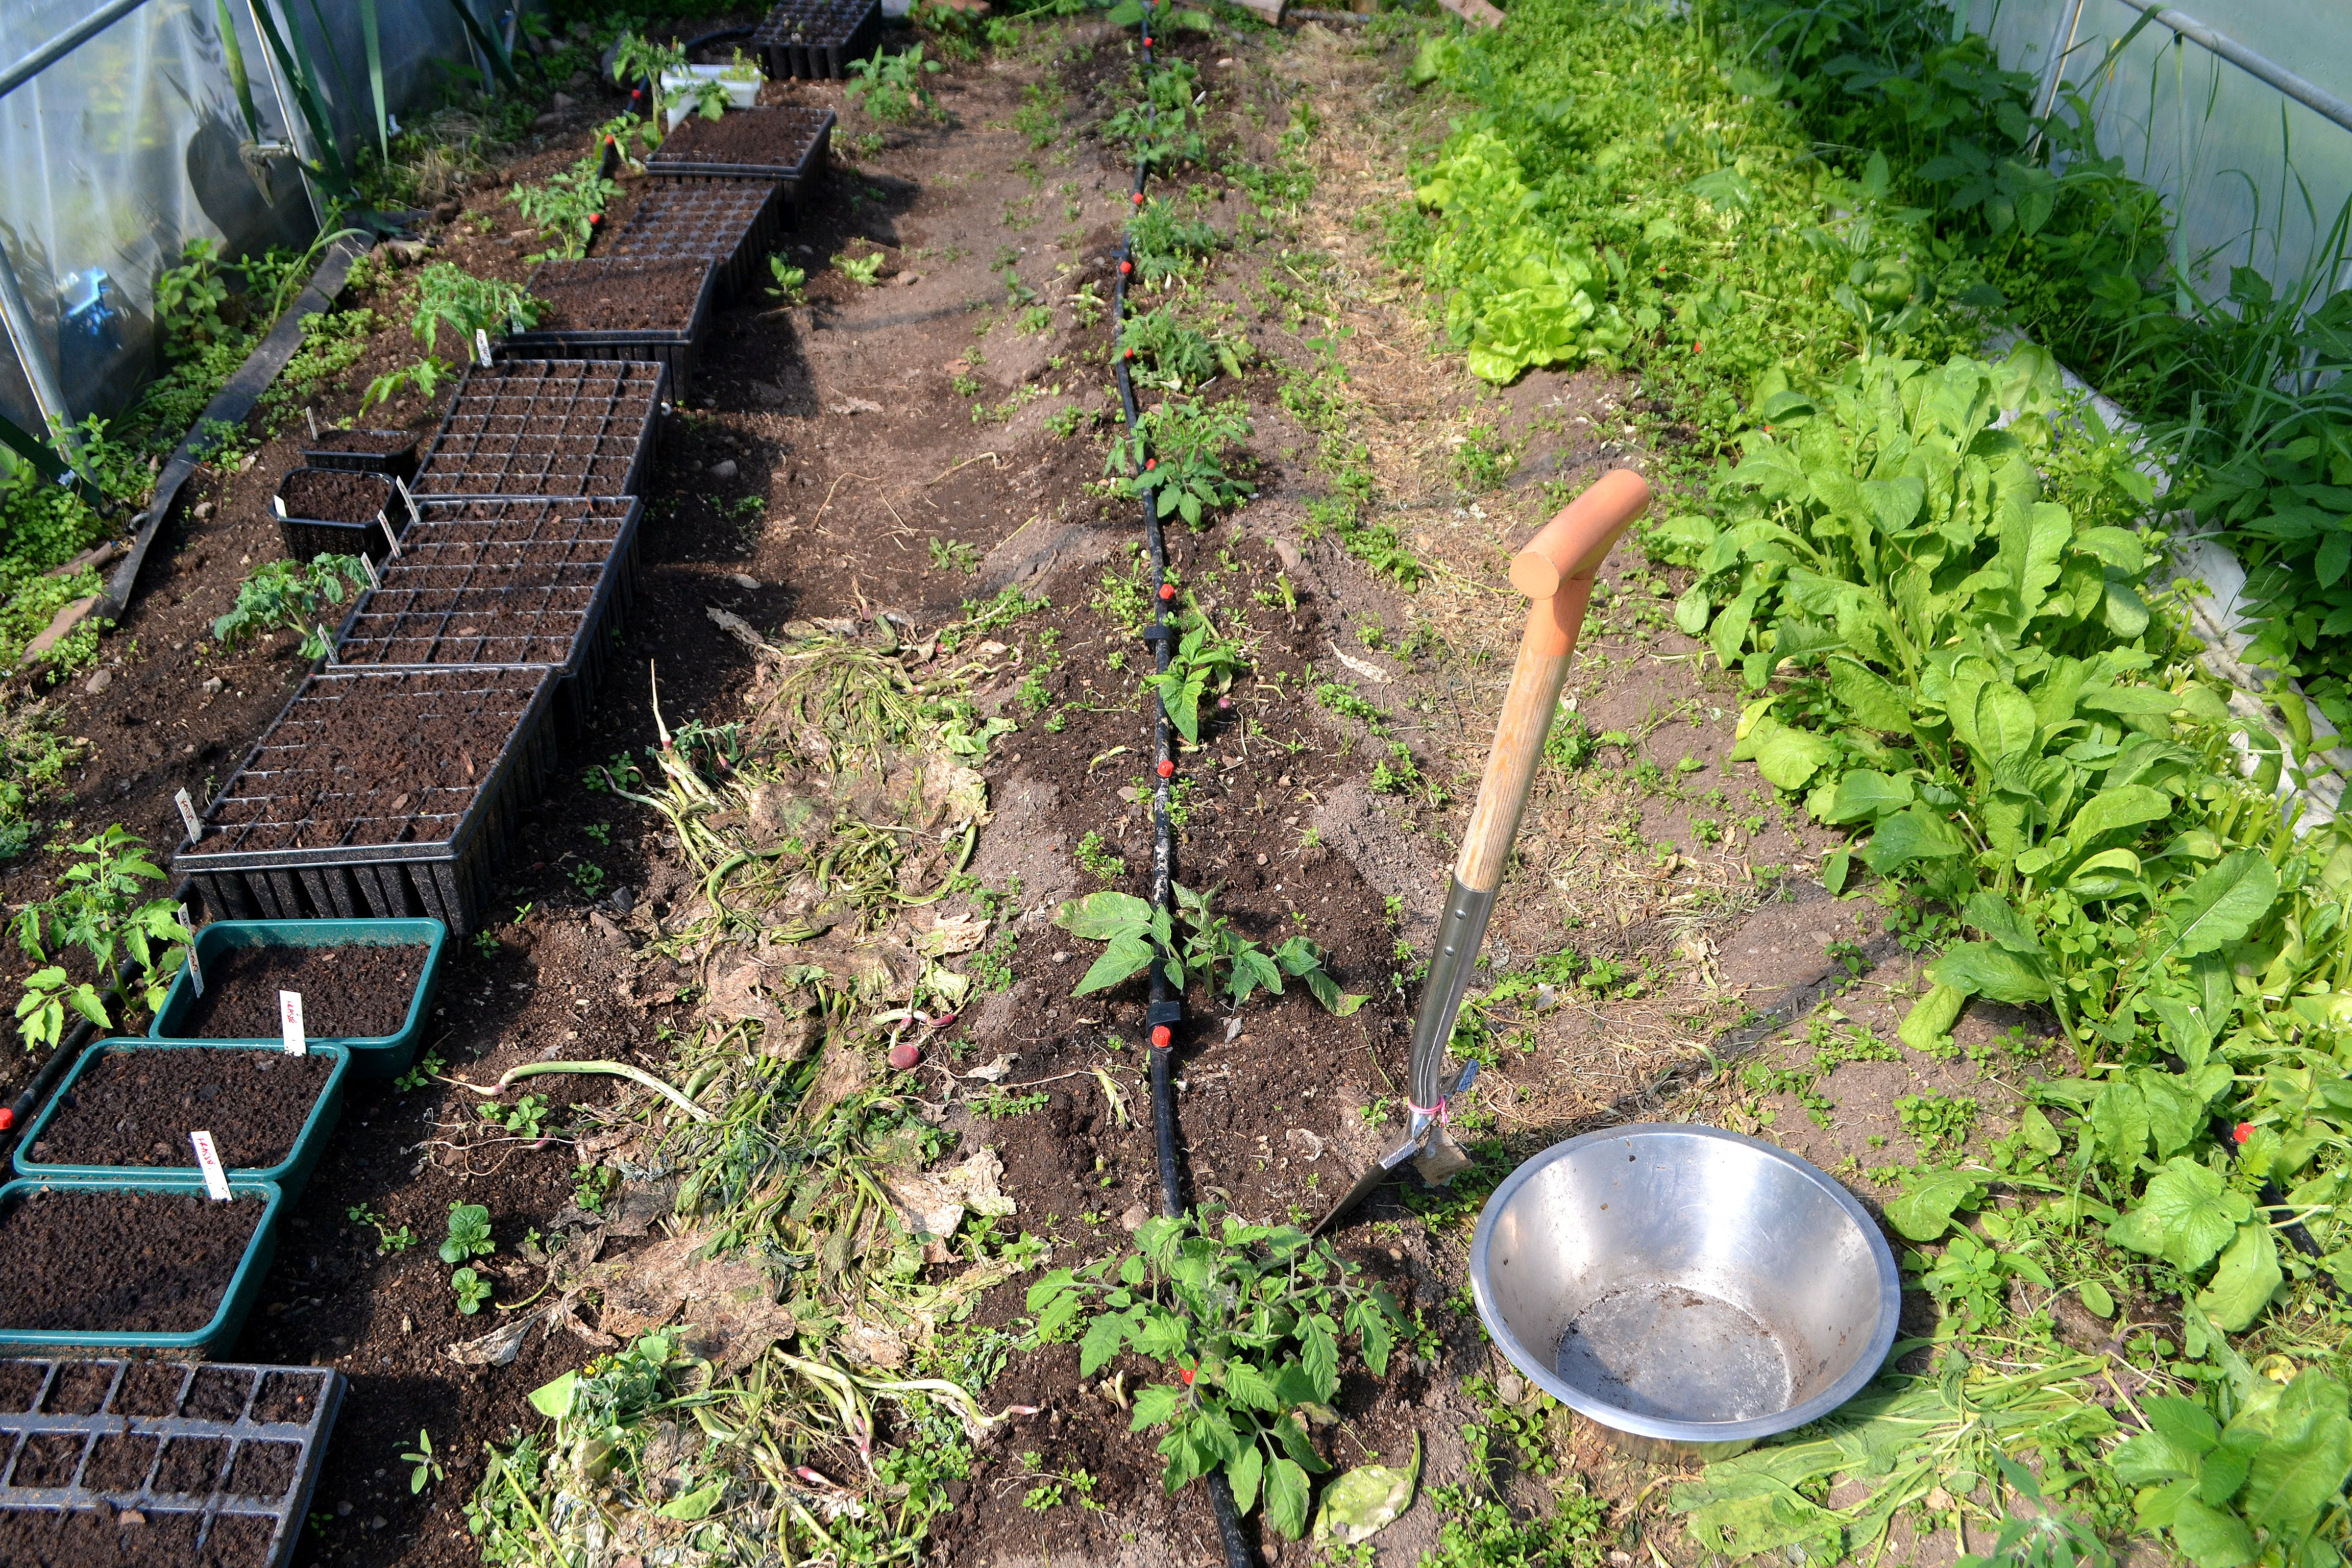 Bild på marken med odling i ett litet tunnelväxthus. Soil analysis, small polytunnel.